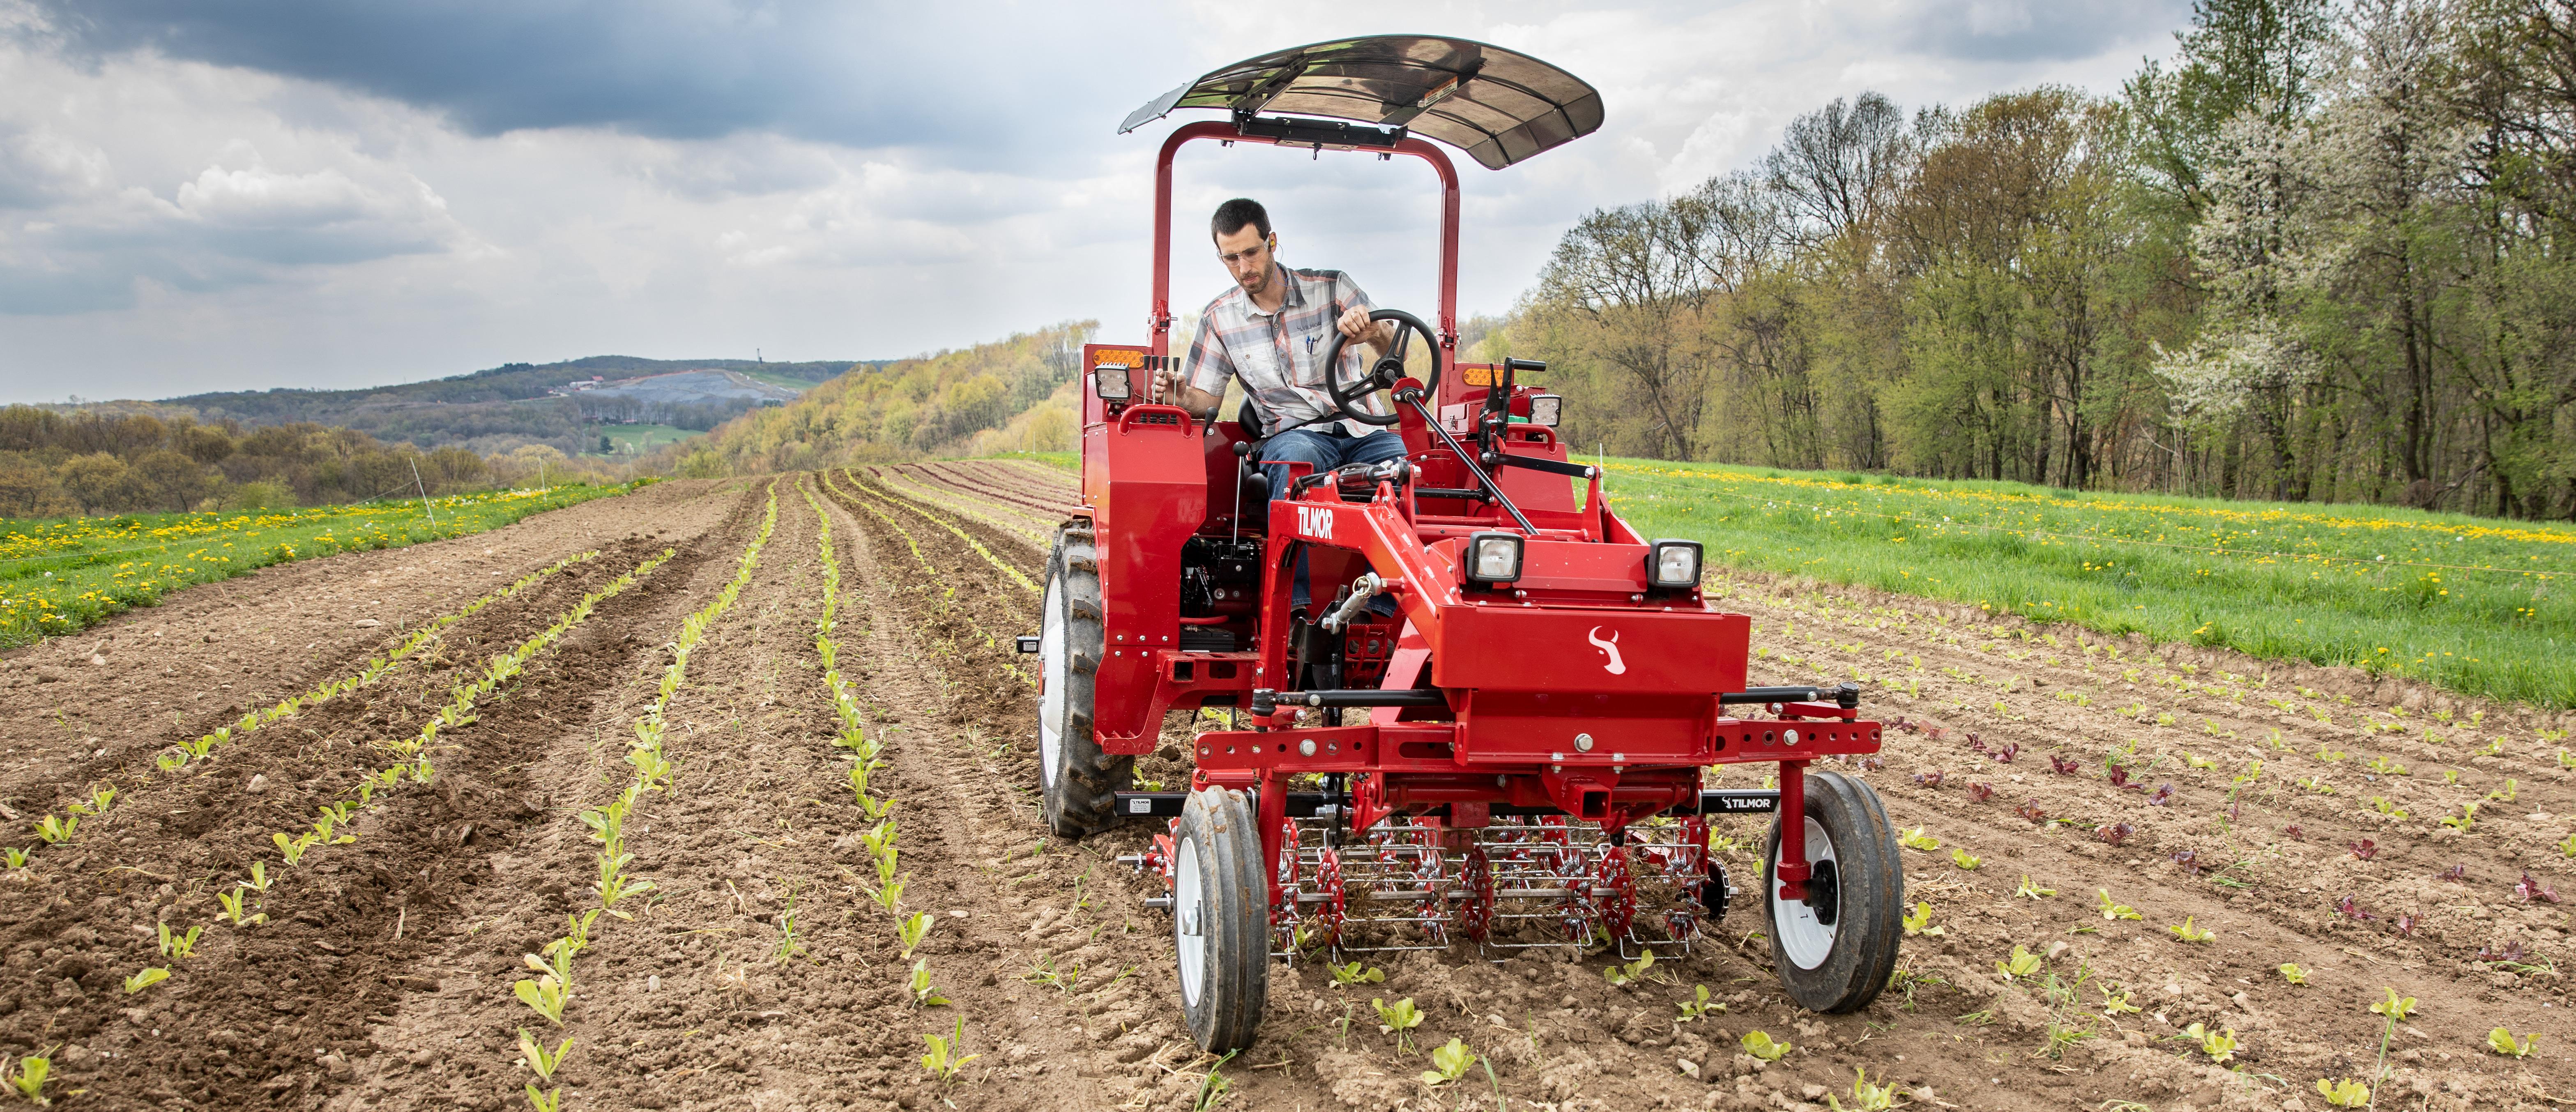 Tilmor Tractor basket weeding